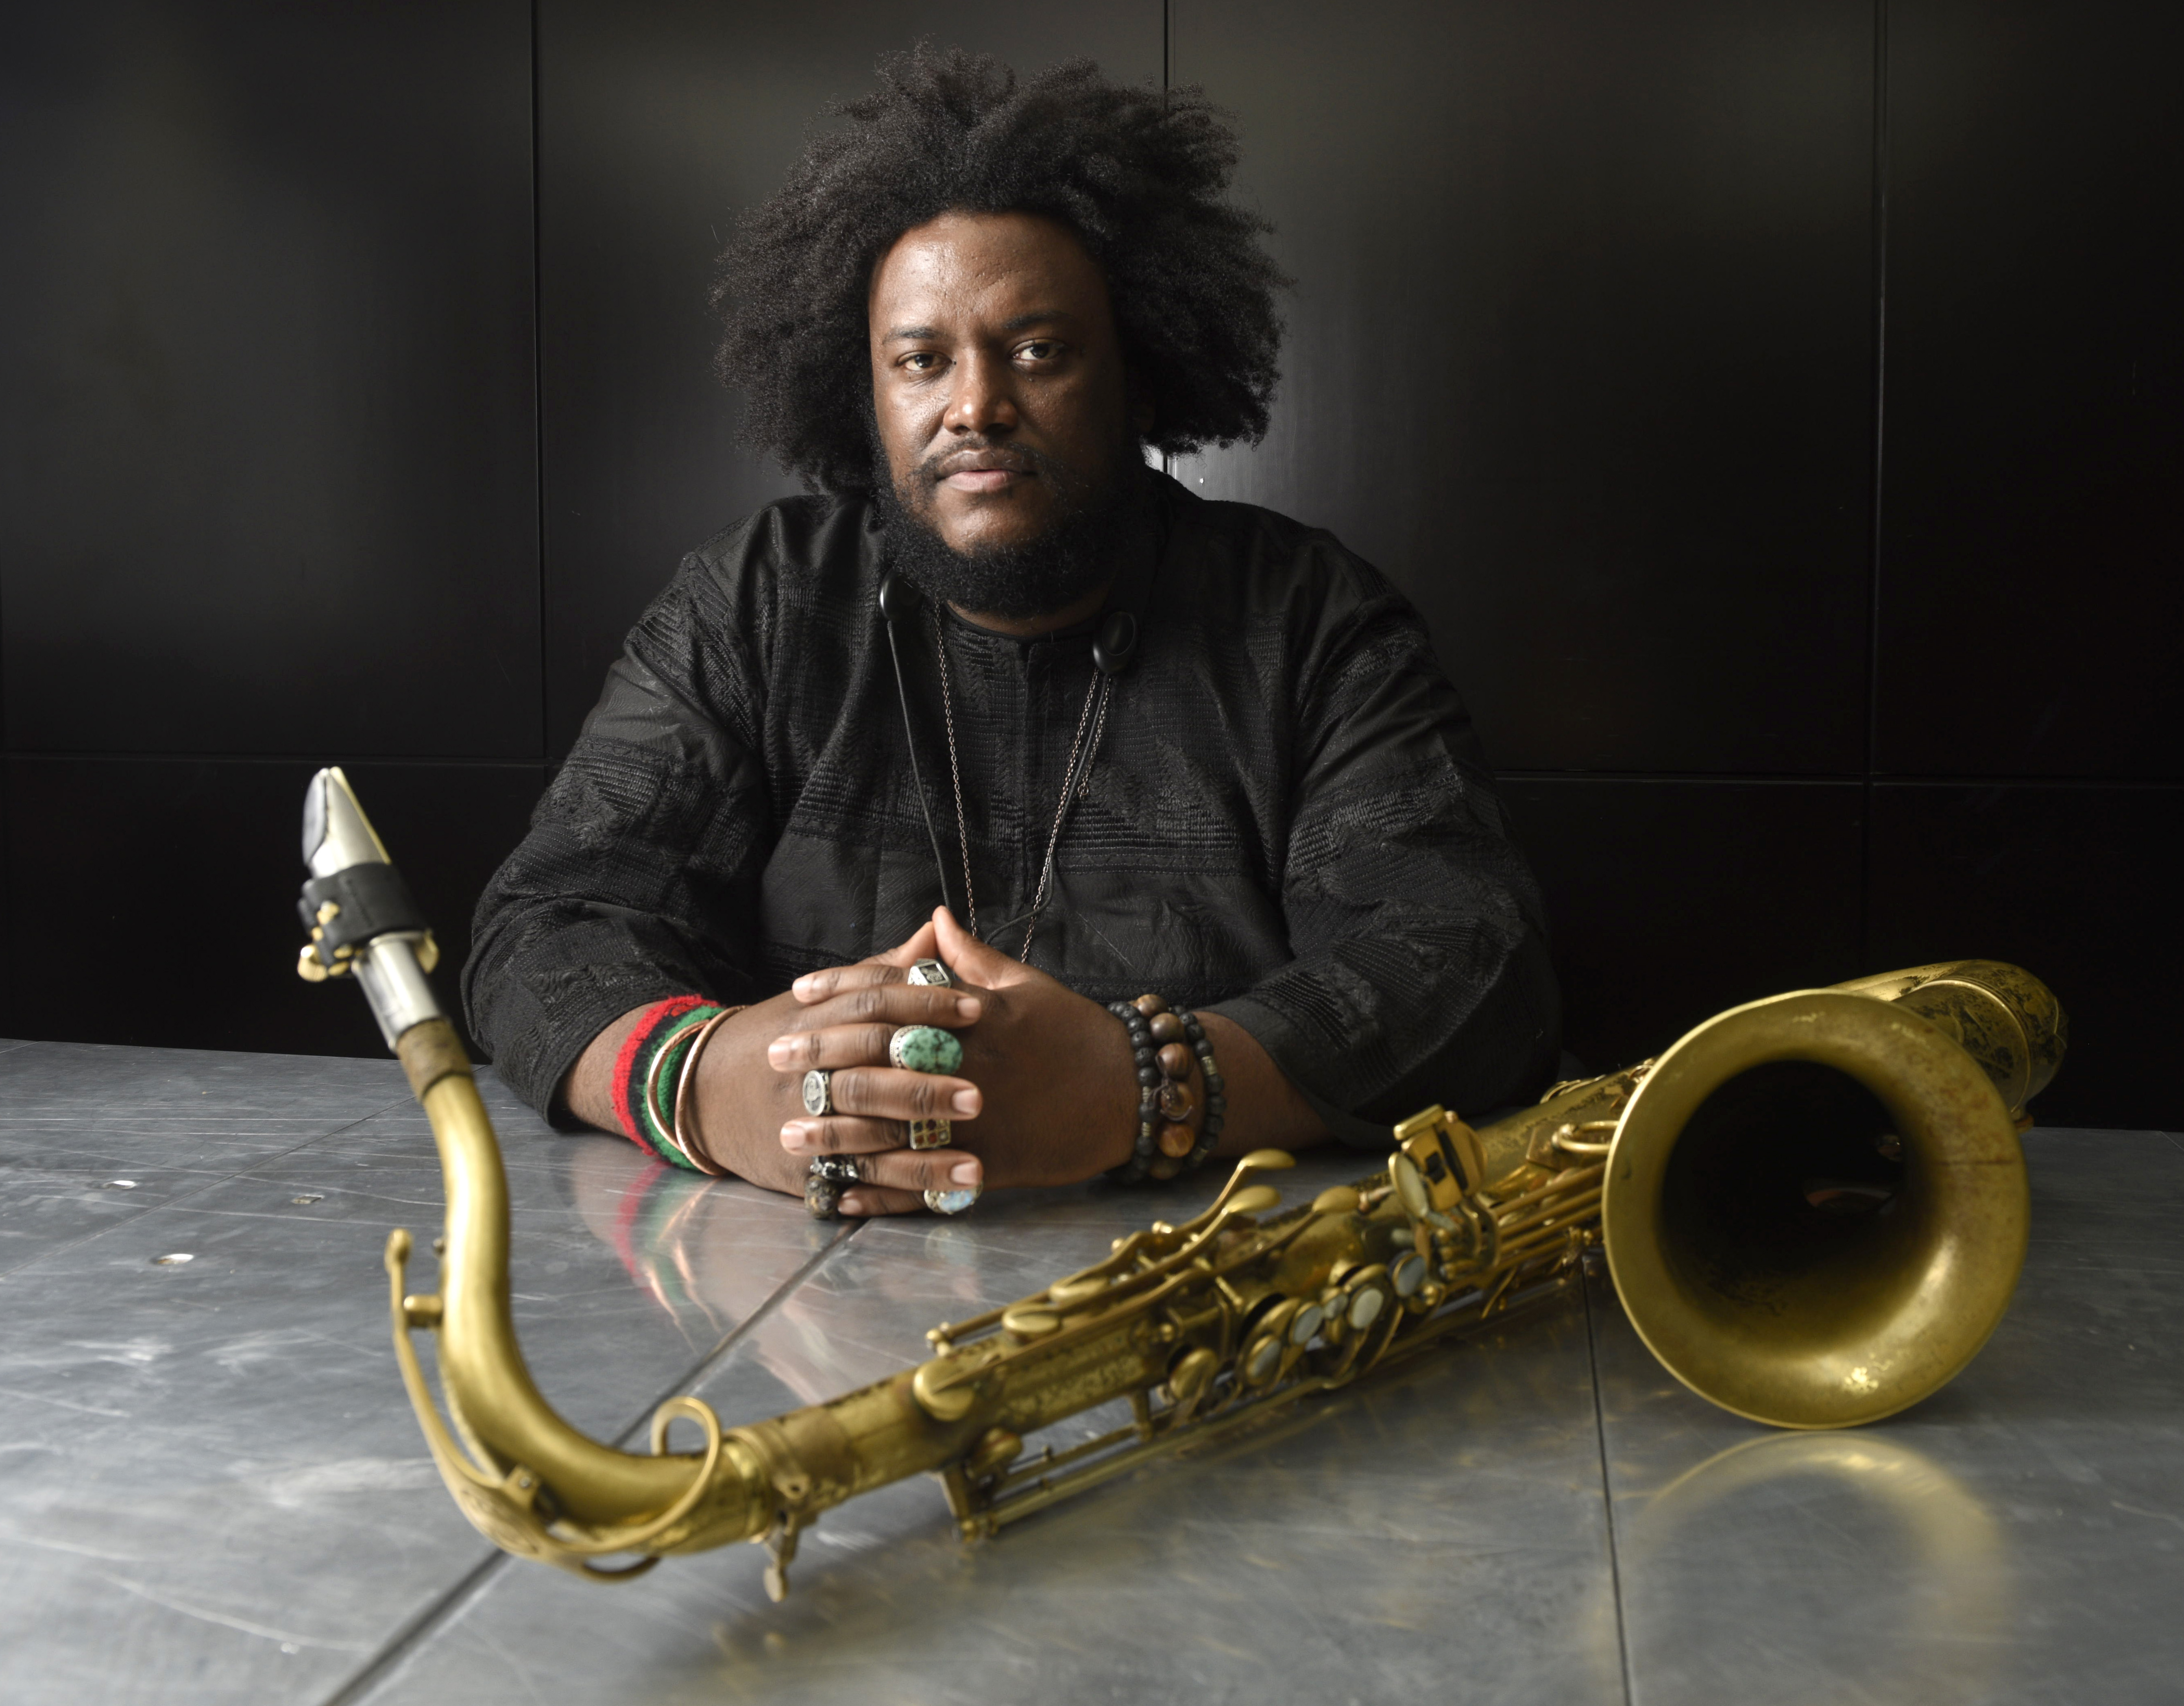 Kamasi Washington's Epic Jazz Hits UCSB - The Santa Barbara